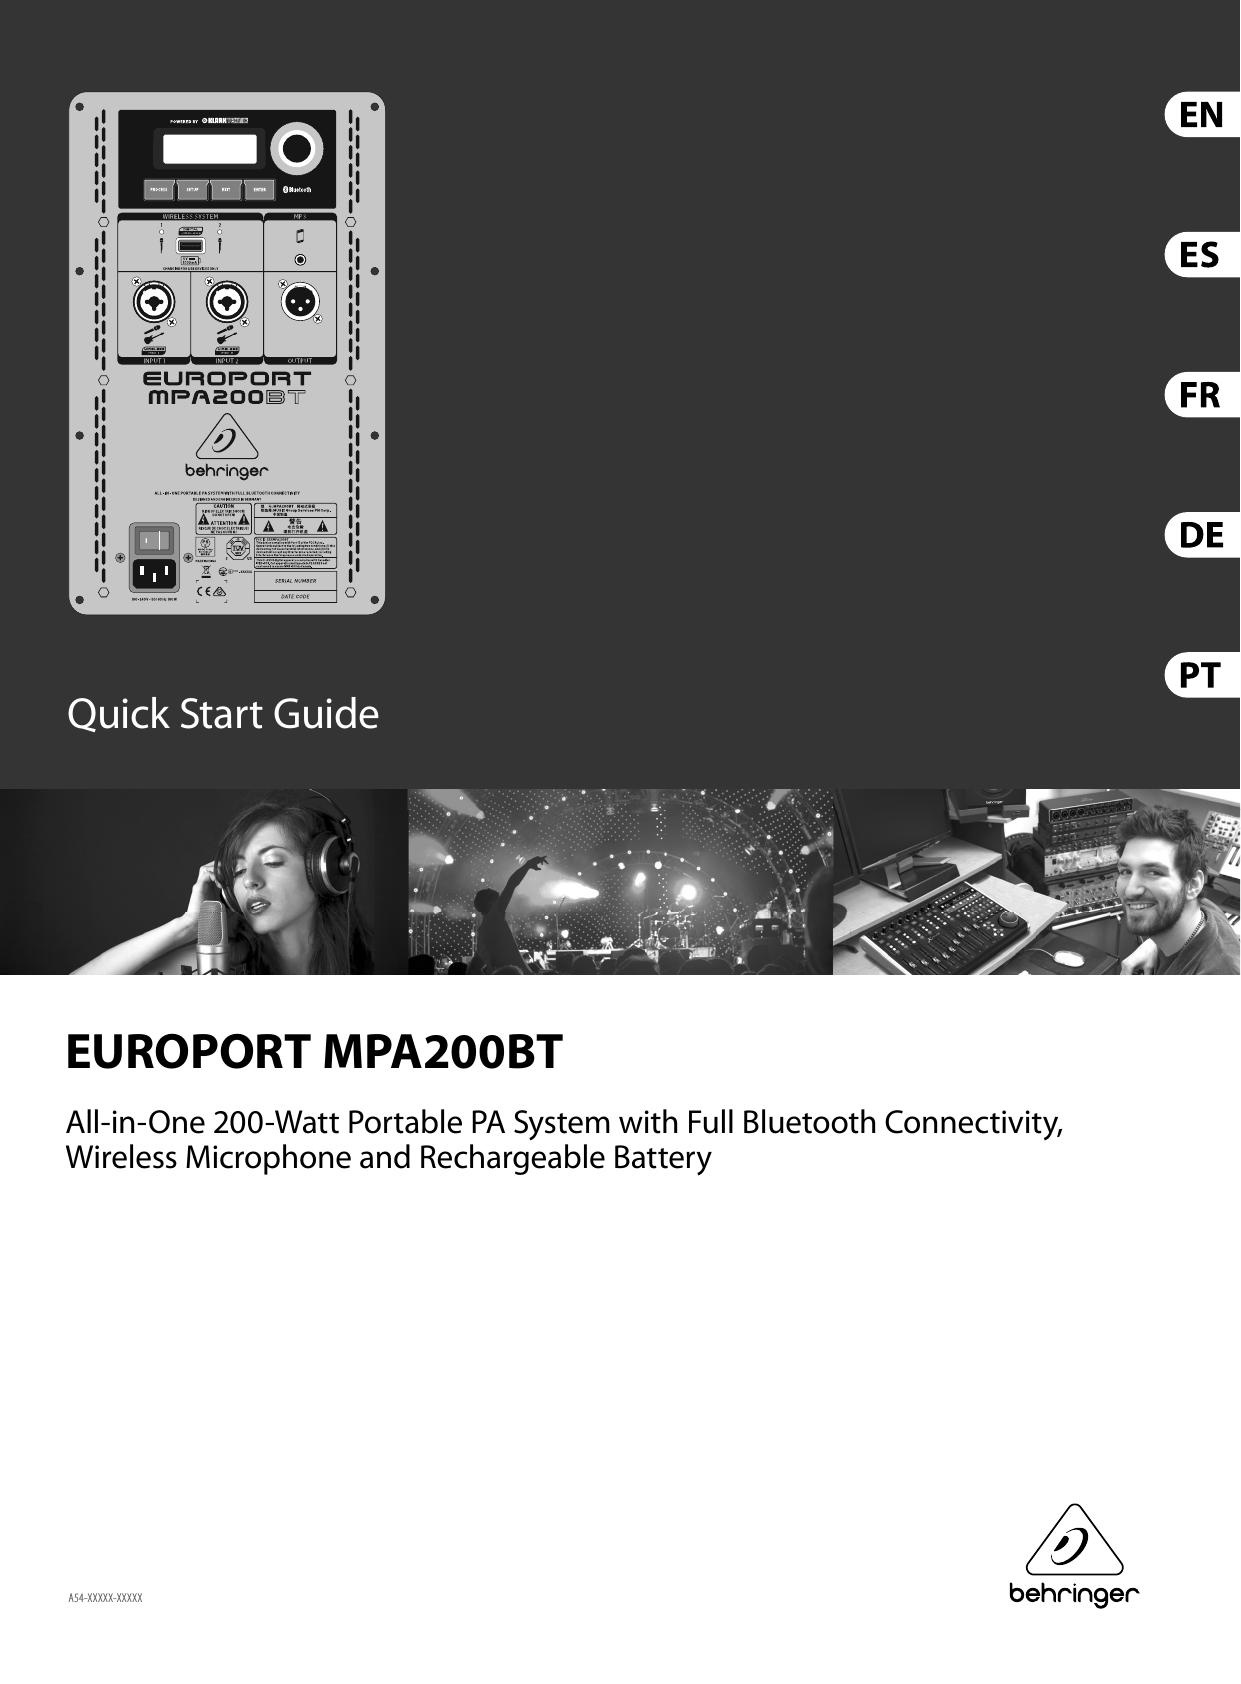 Soundlabs Group Speaker Basics Manual Guide